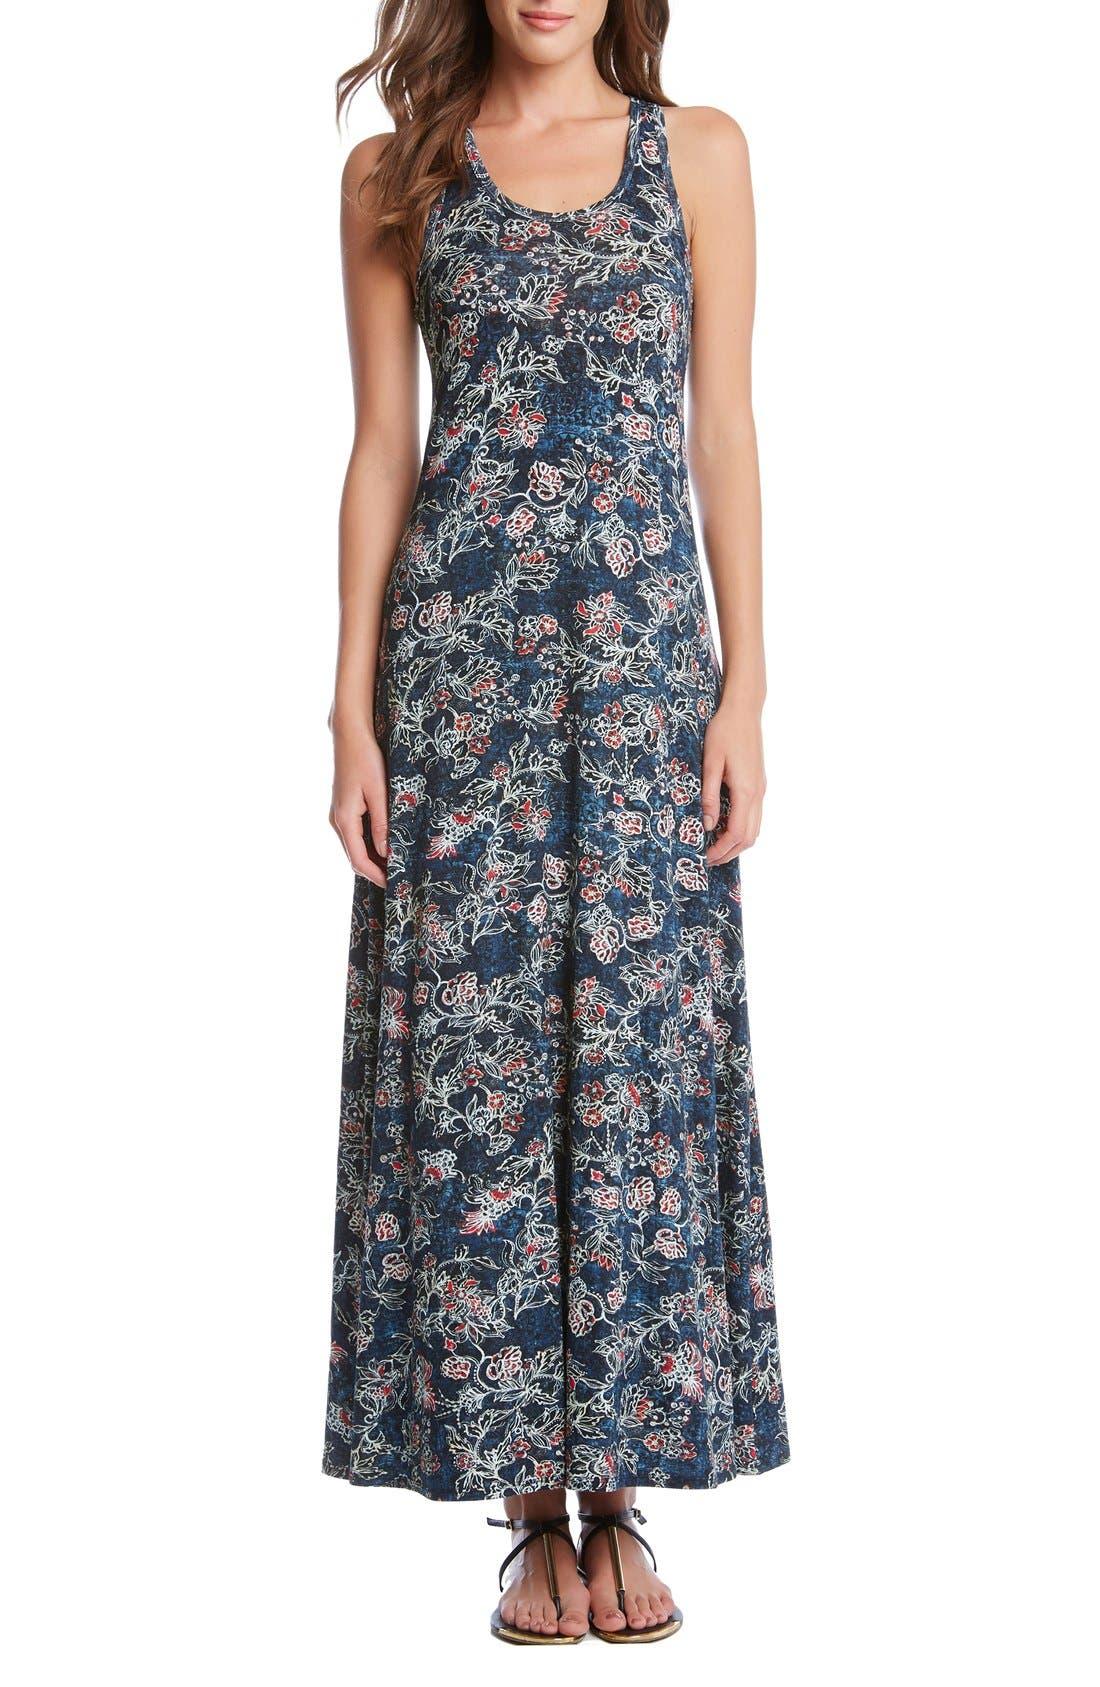 Main Image - Karen Kane 'Tasha' Batik Floral Print Jersey Maxi Dress